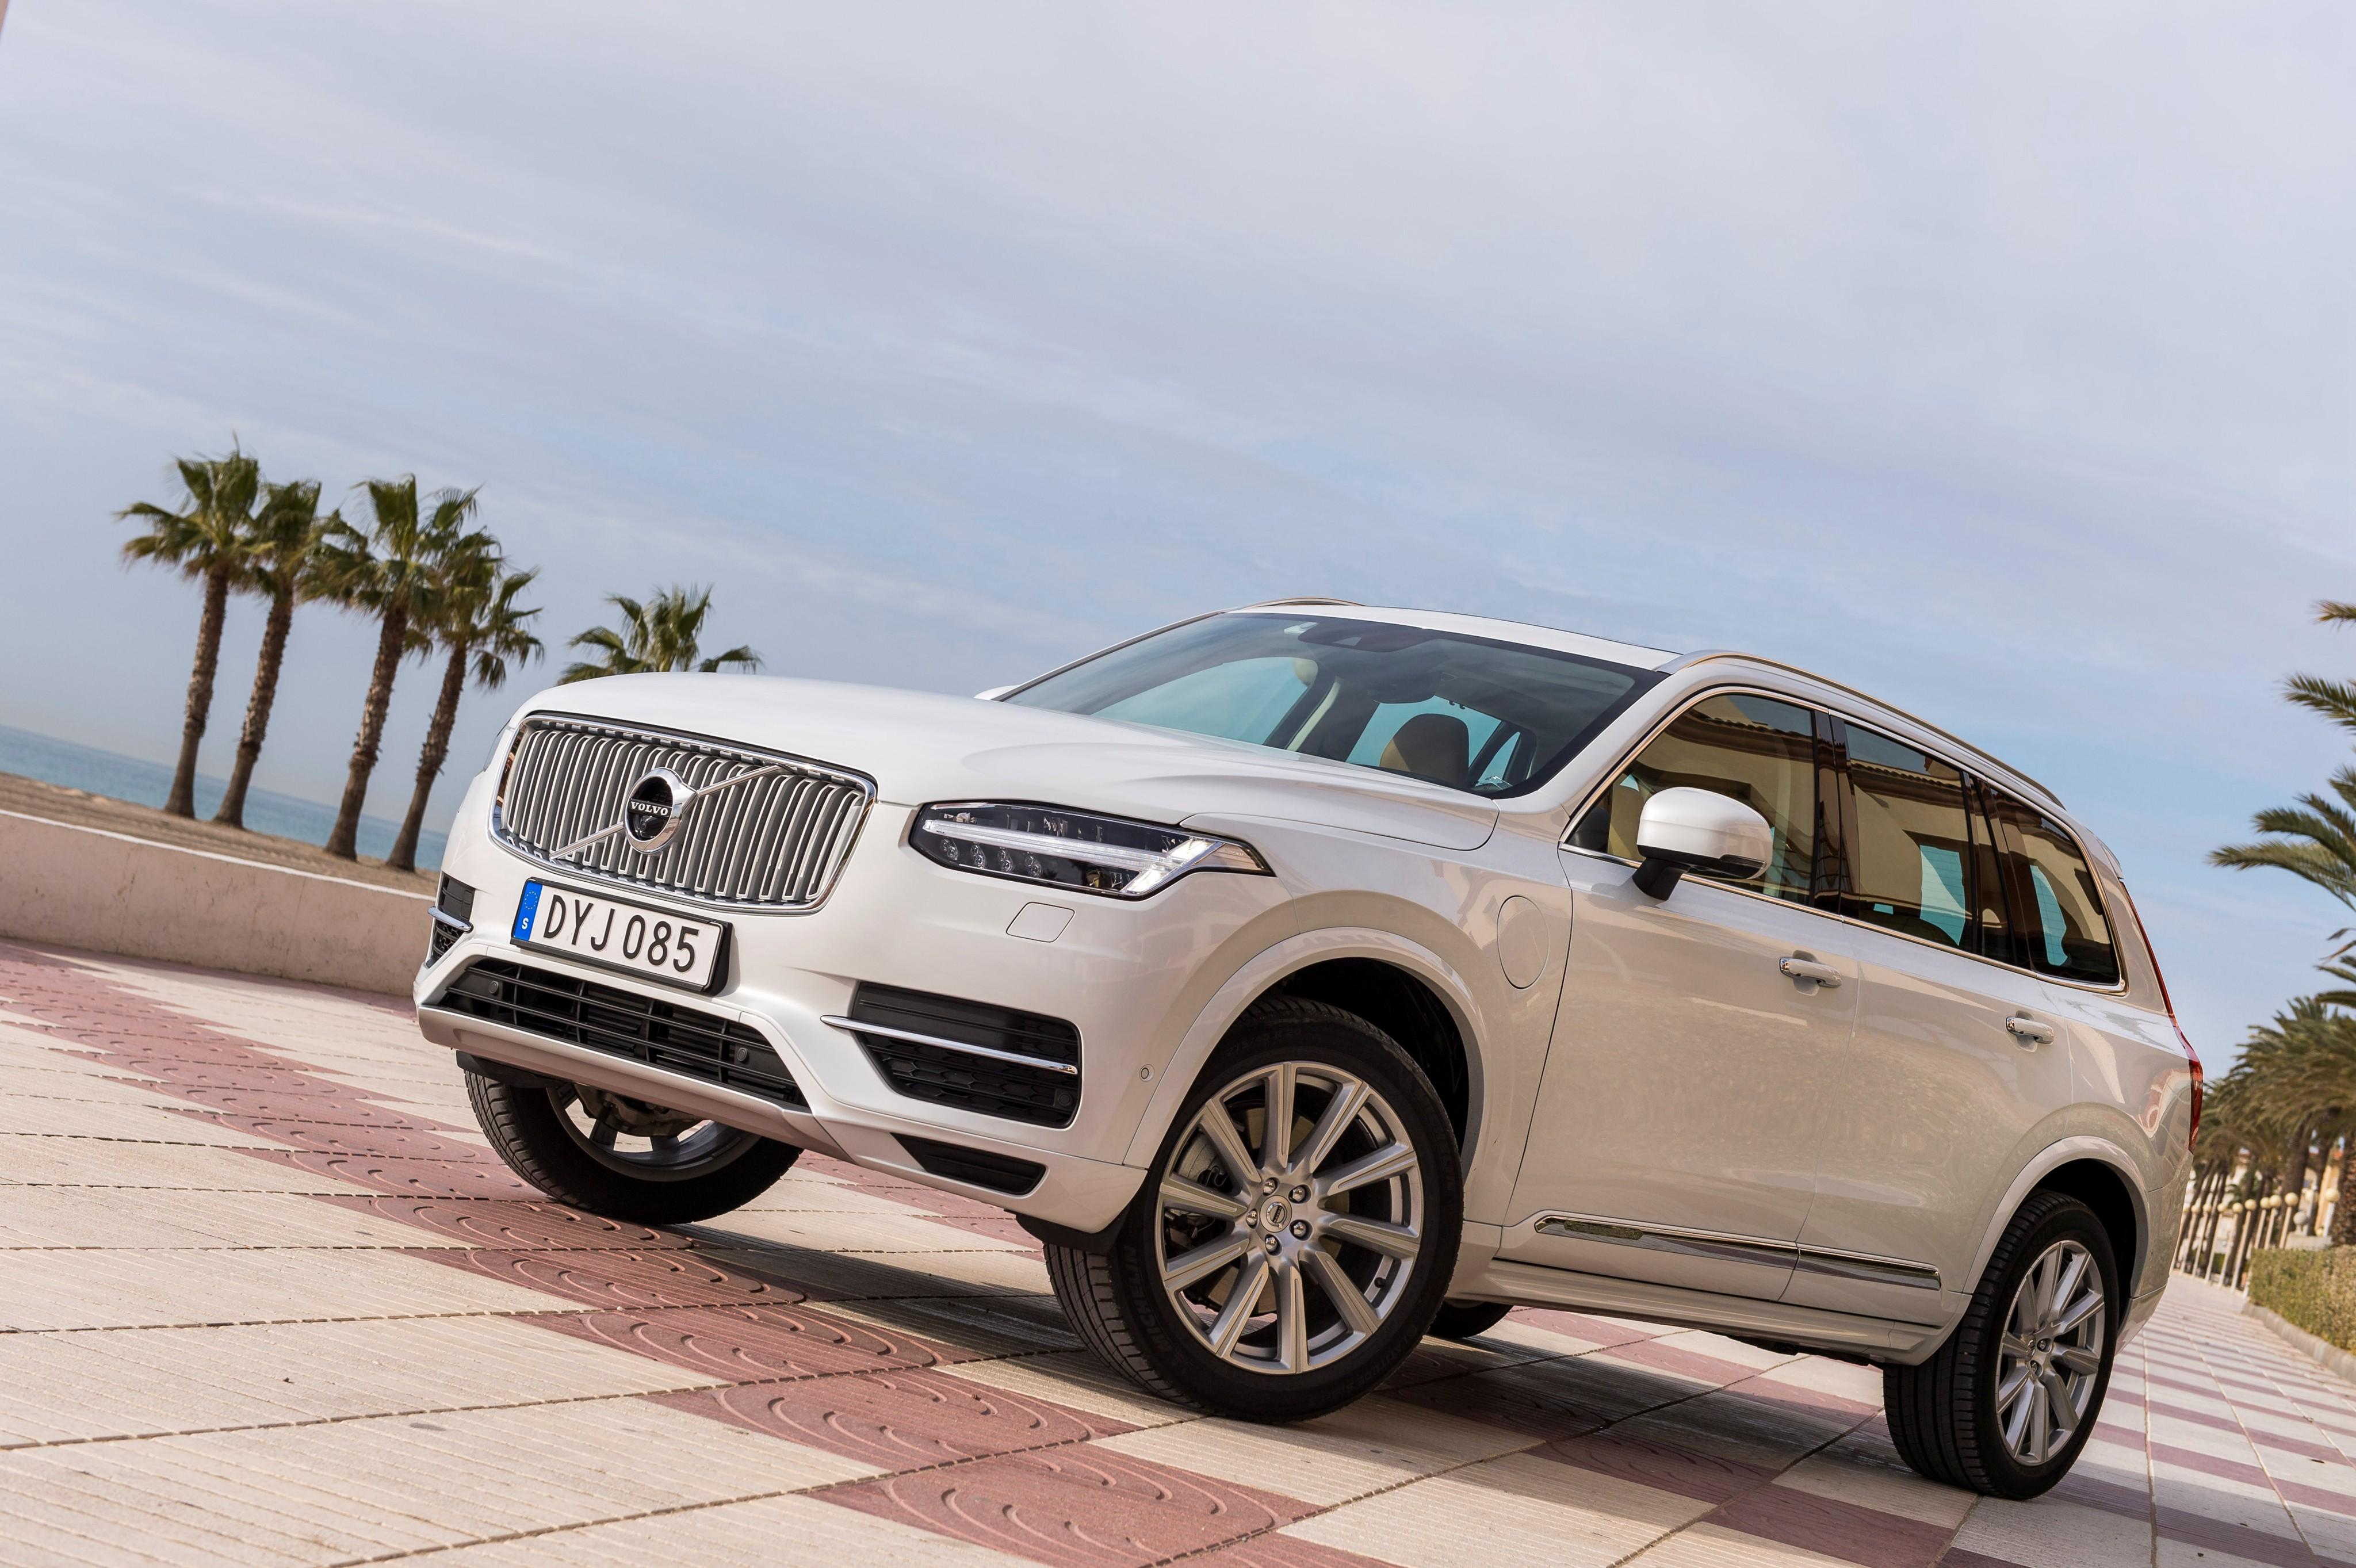 review volvo news luxury rita ultimate offers mar xc times car img cook washington suv